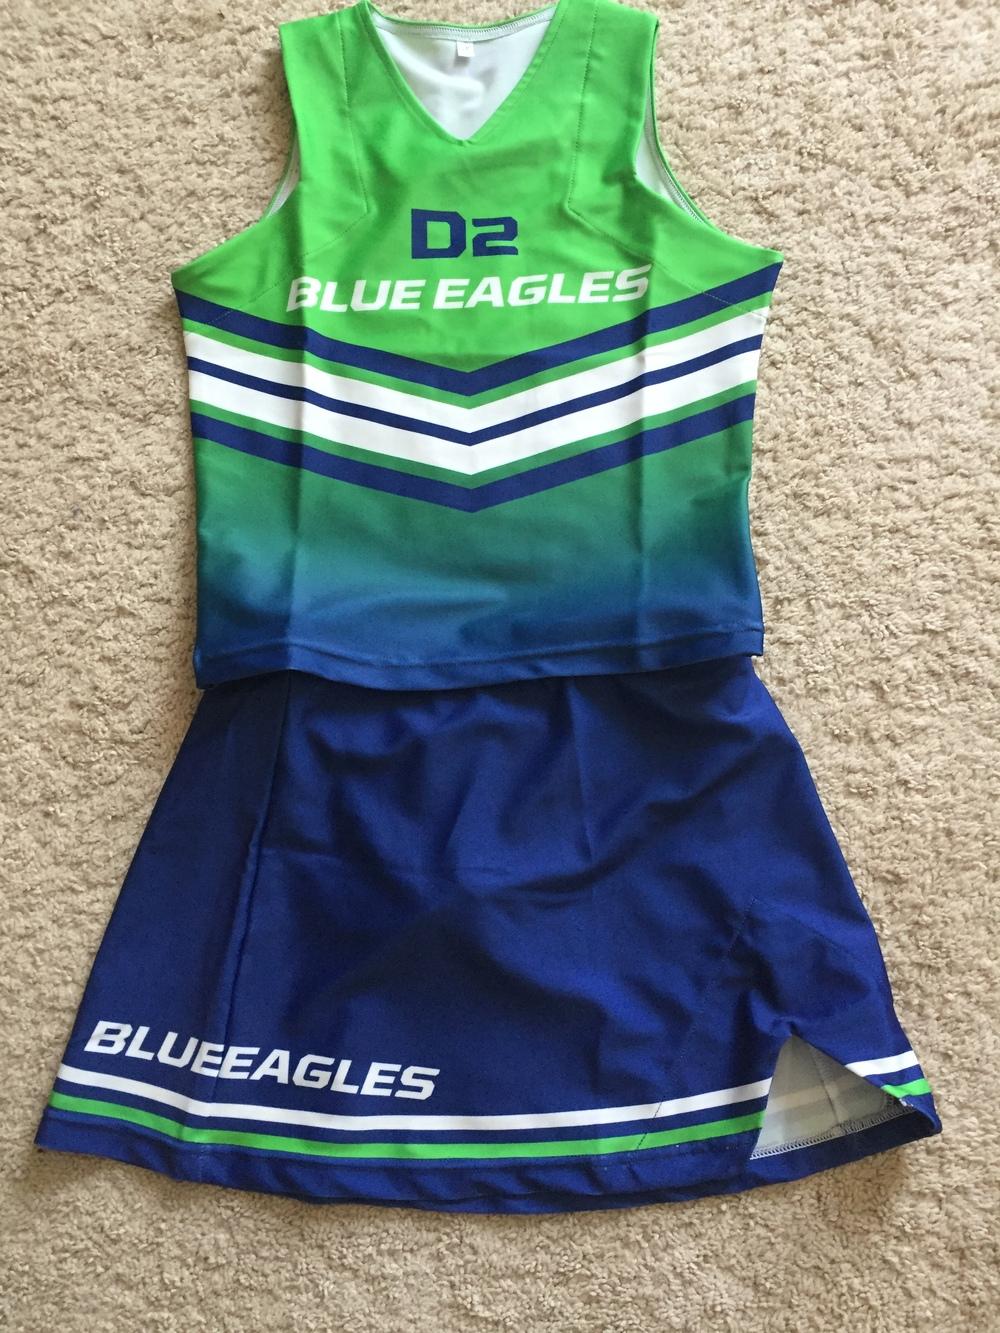 D2 BLUE EAGLES green blue white CHEERLEADING jersey, skirt, top, bottom